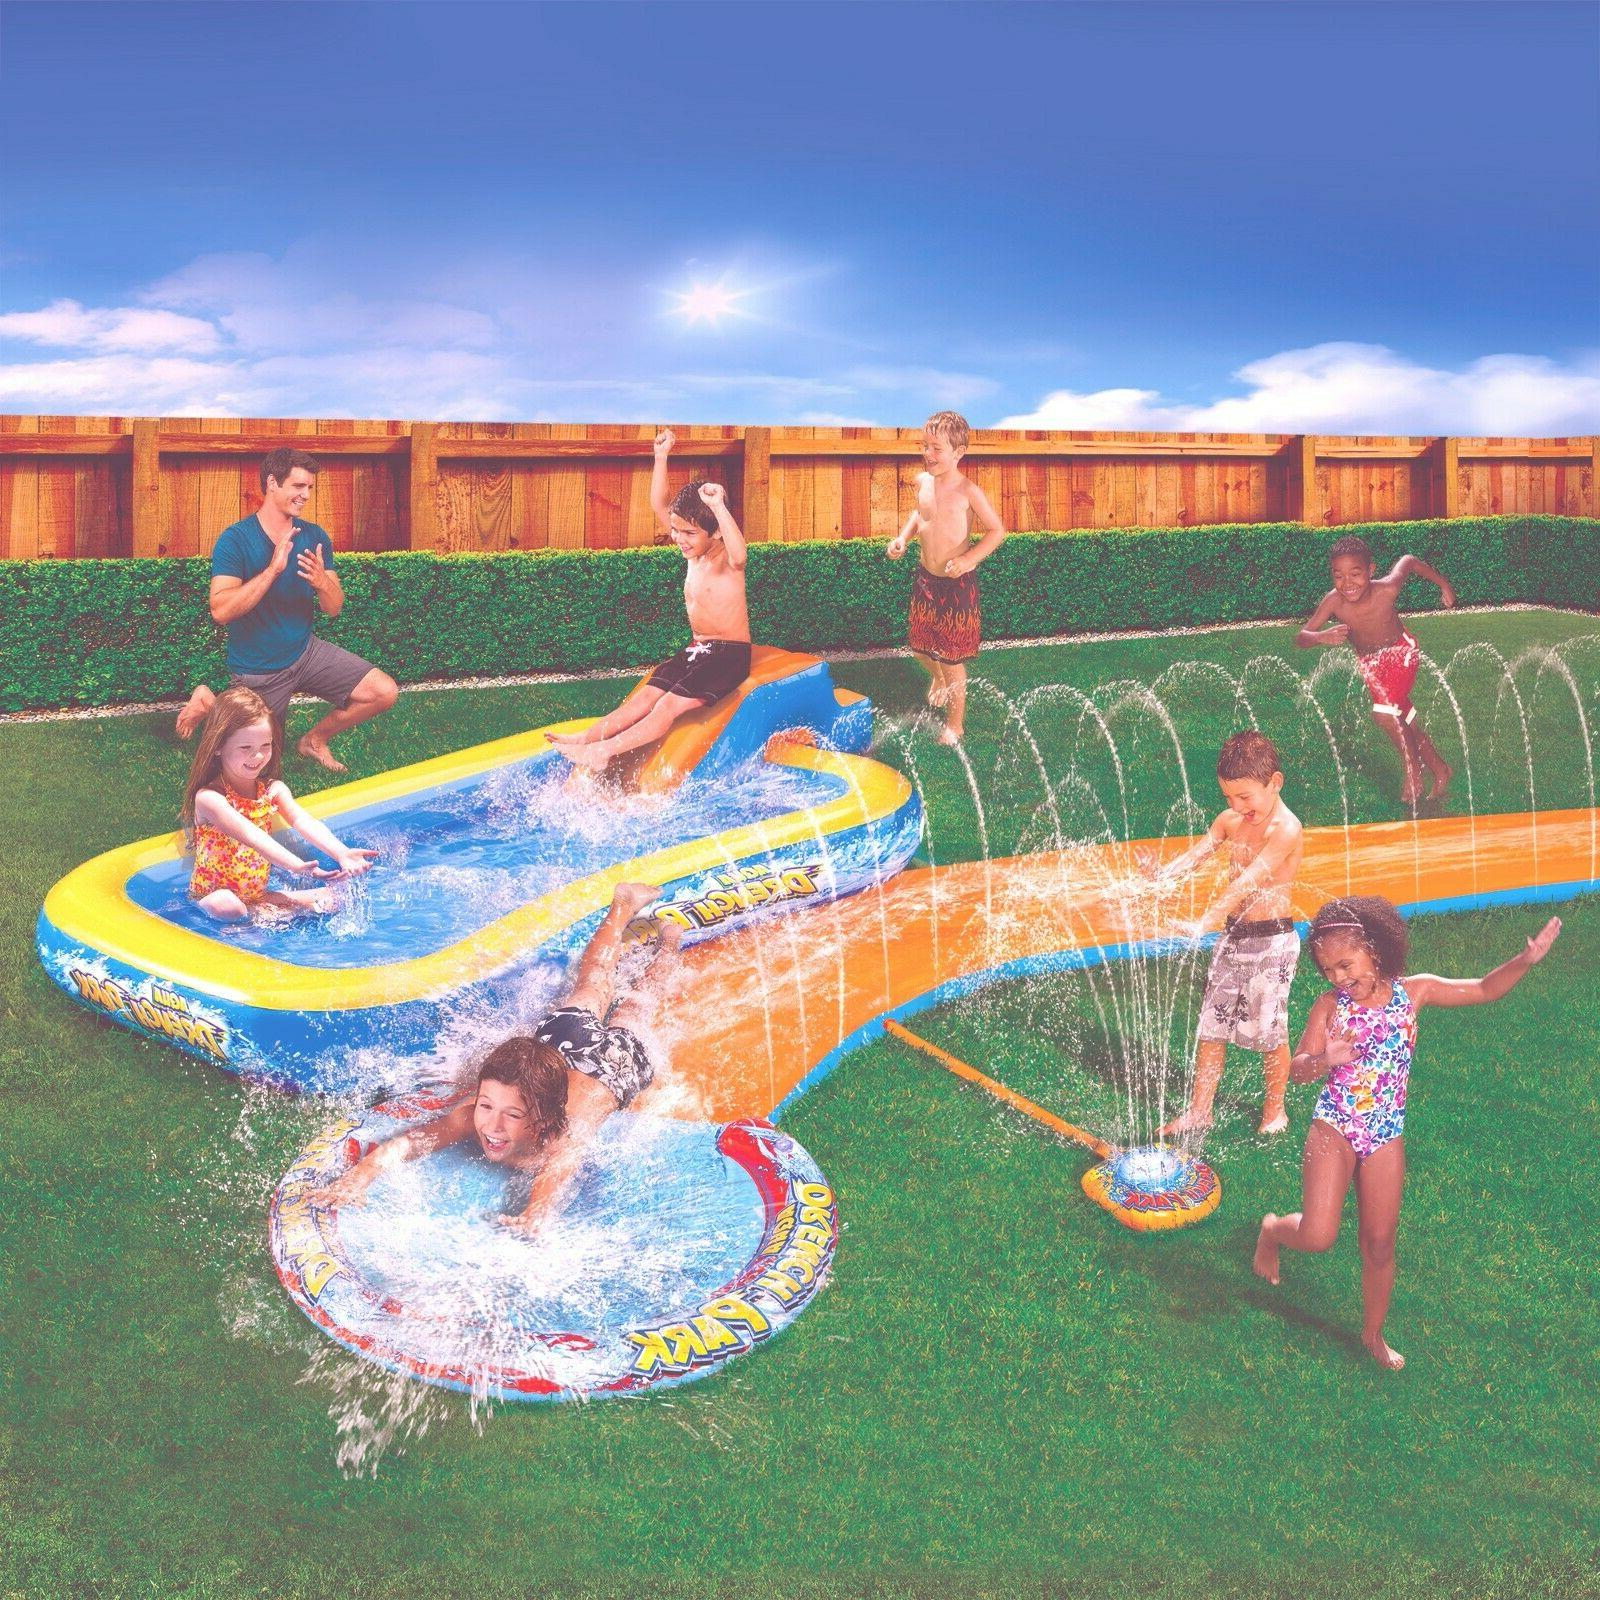 New Banzai Aqua Water Drench Splash w/ Water Inflatable